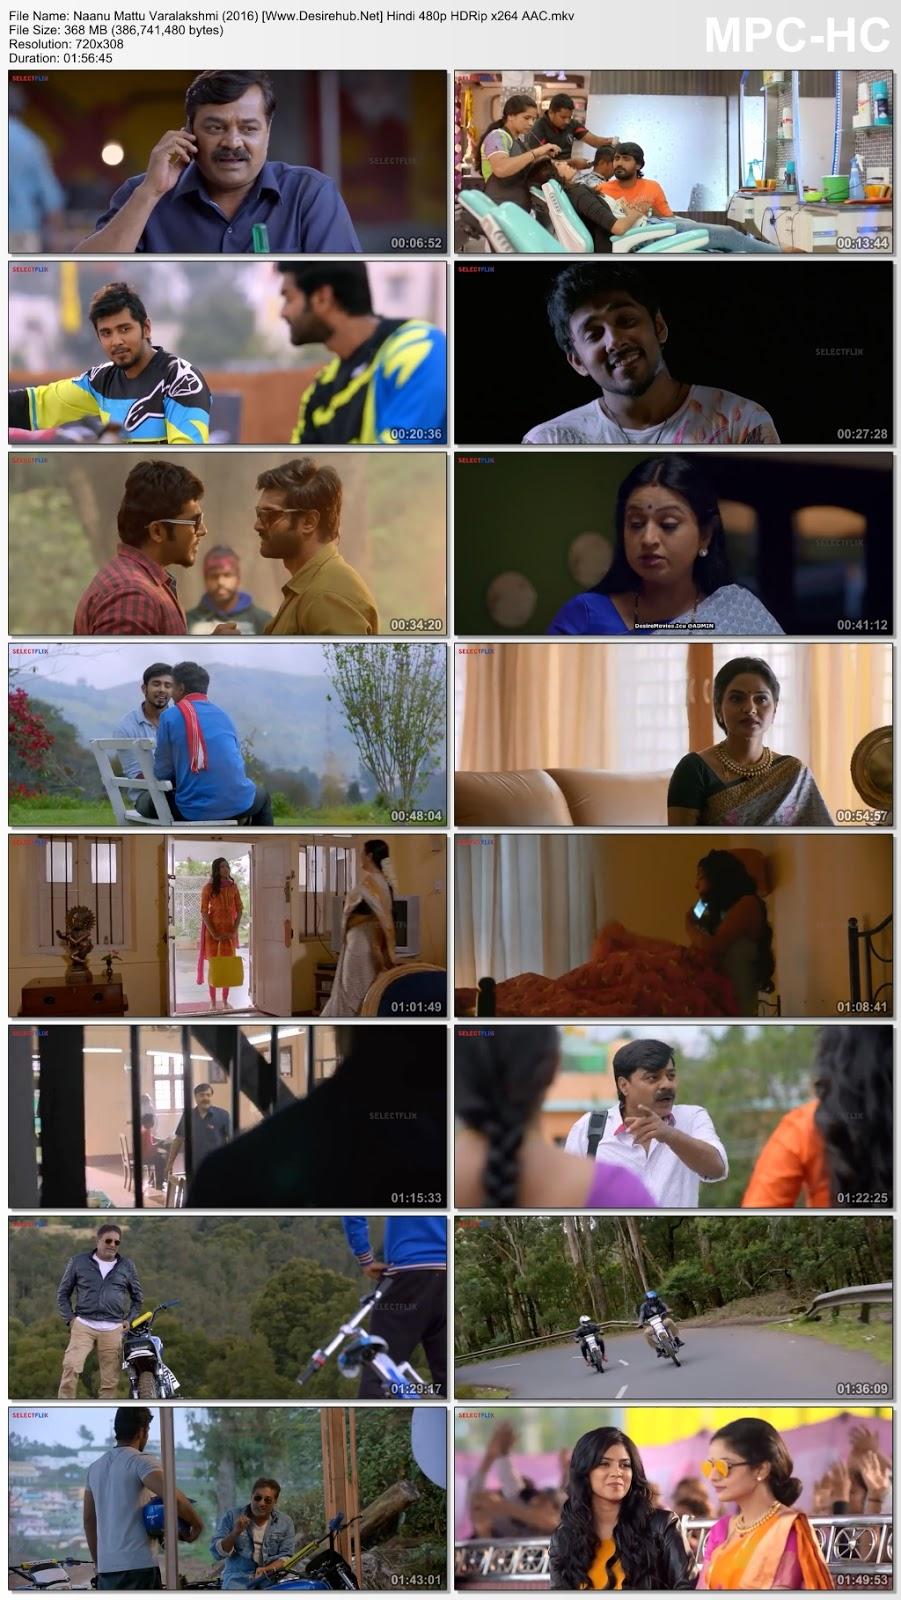 Main Hoon Zakhmi Khiladi (2016) Hindi 480p HDRip x264 AAC – 350MB Desirehub